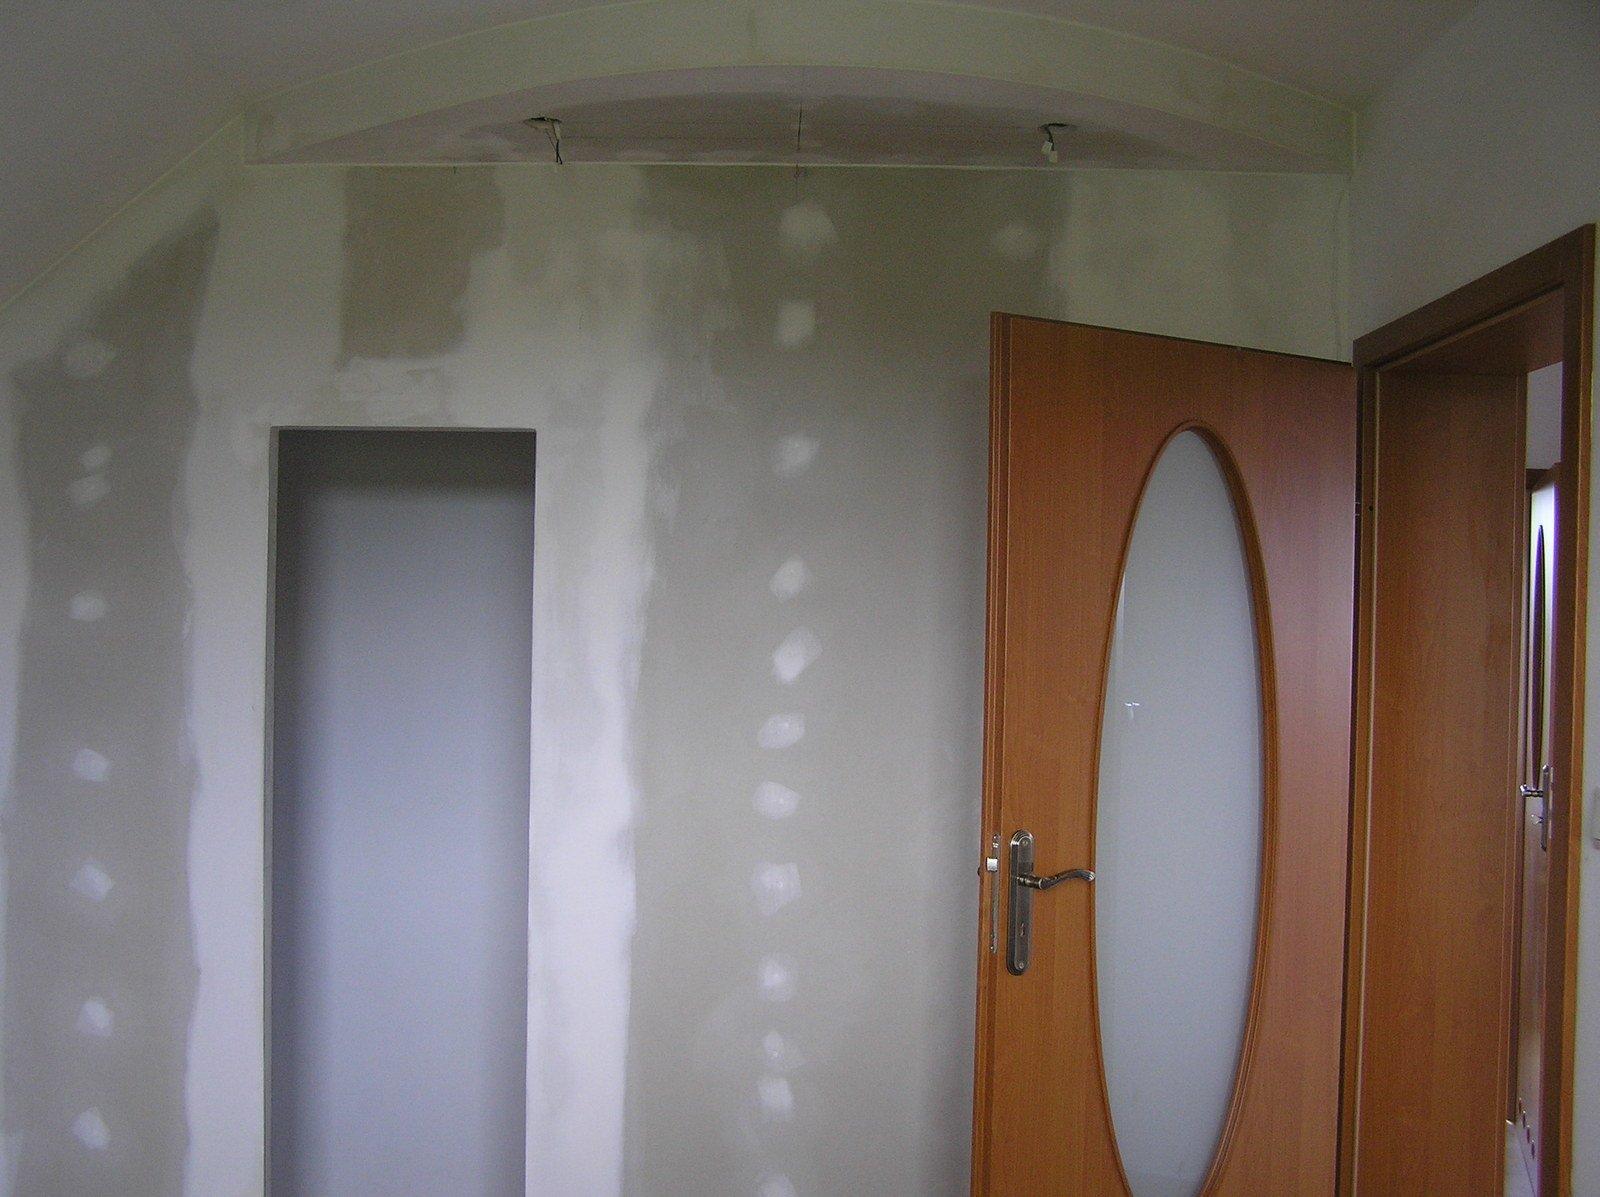 szafa wnękowa w sypialni